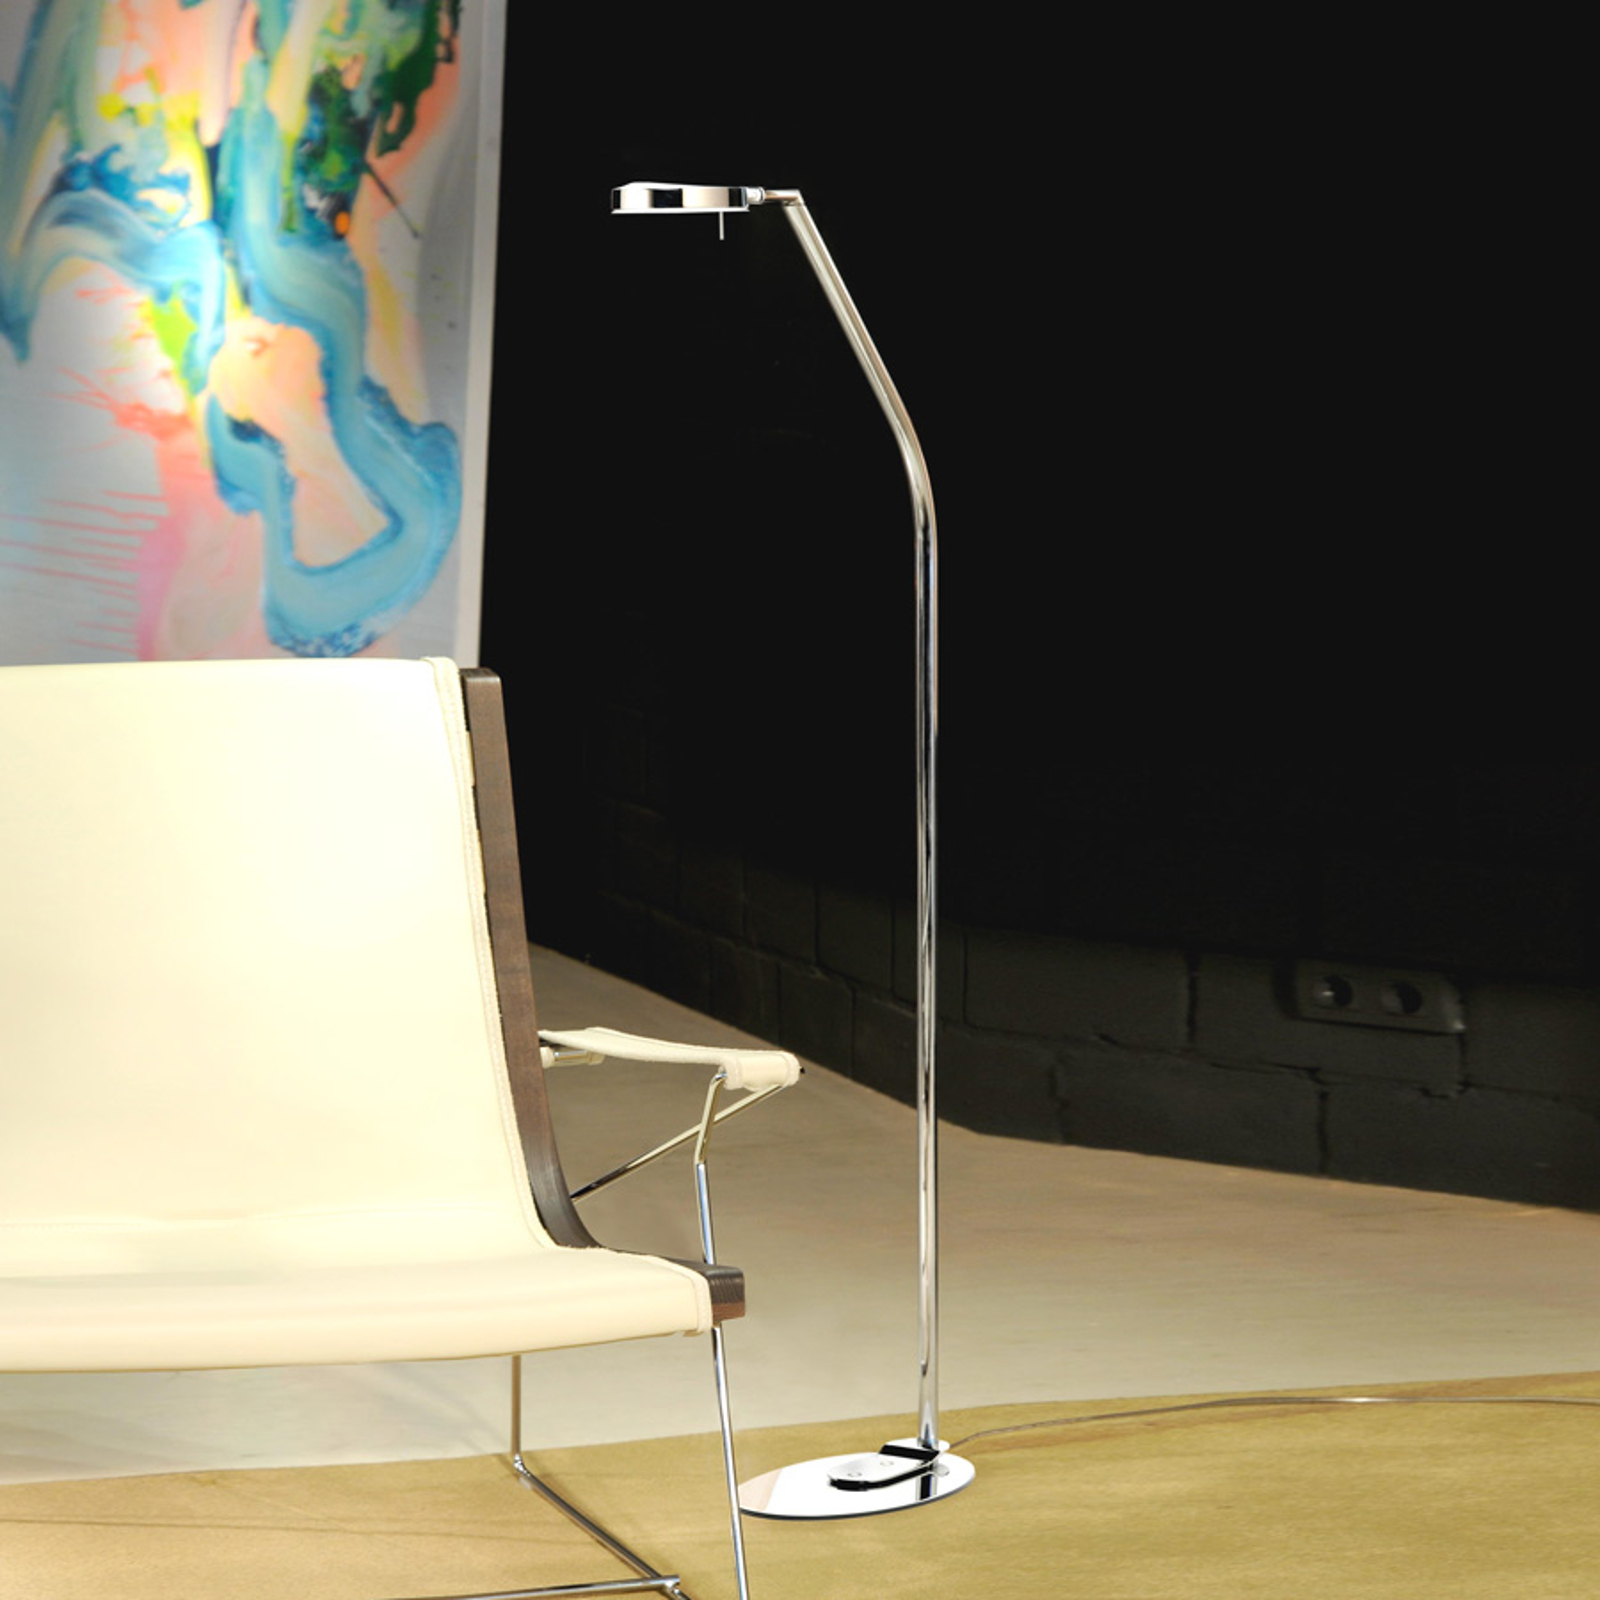 Moderni 3-LED-lattiavalaisin, 1 lamppu, 124,3 cm